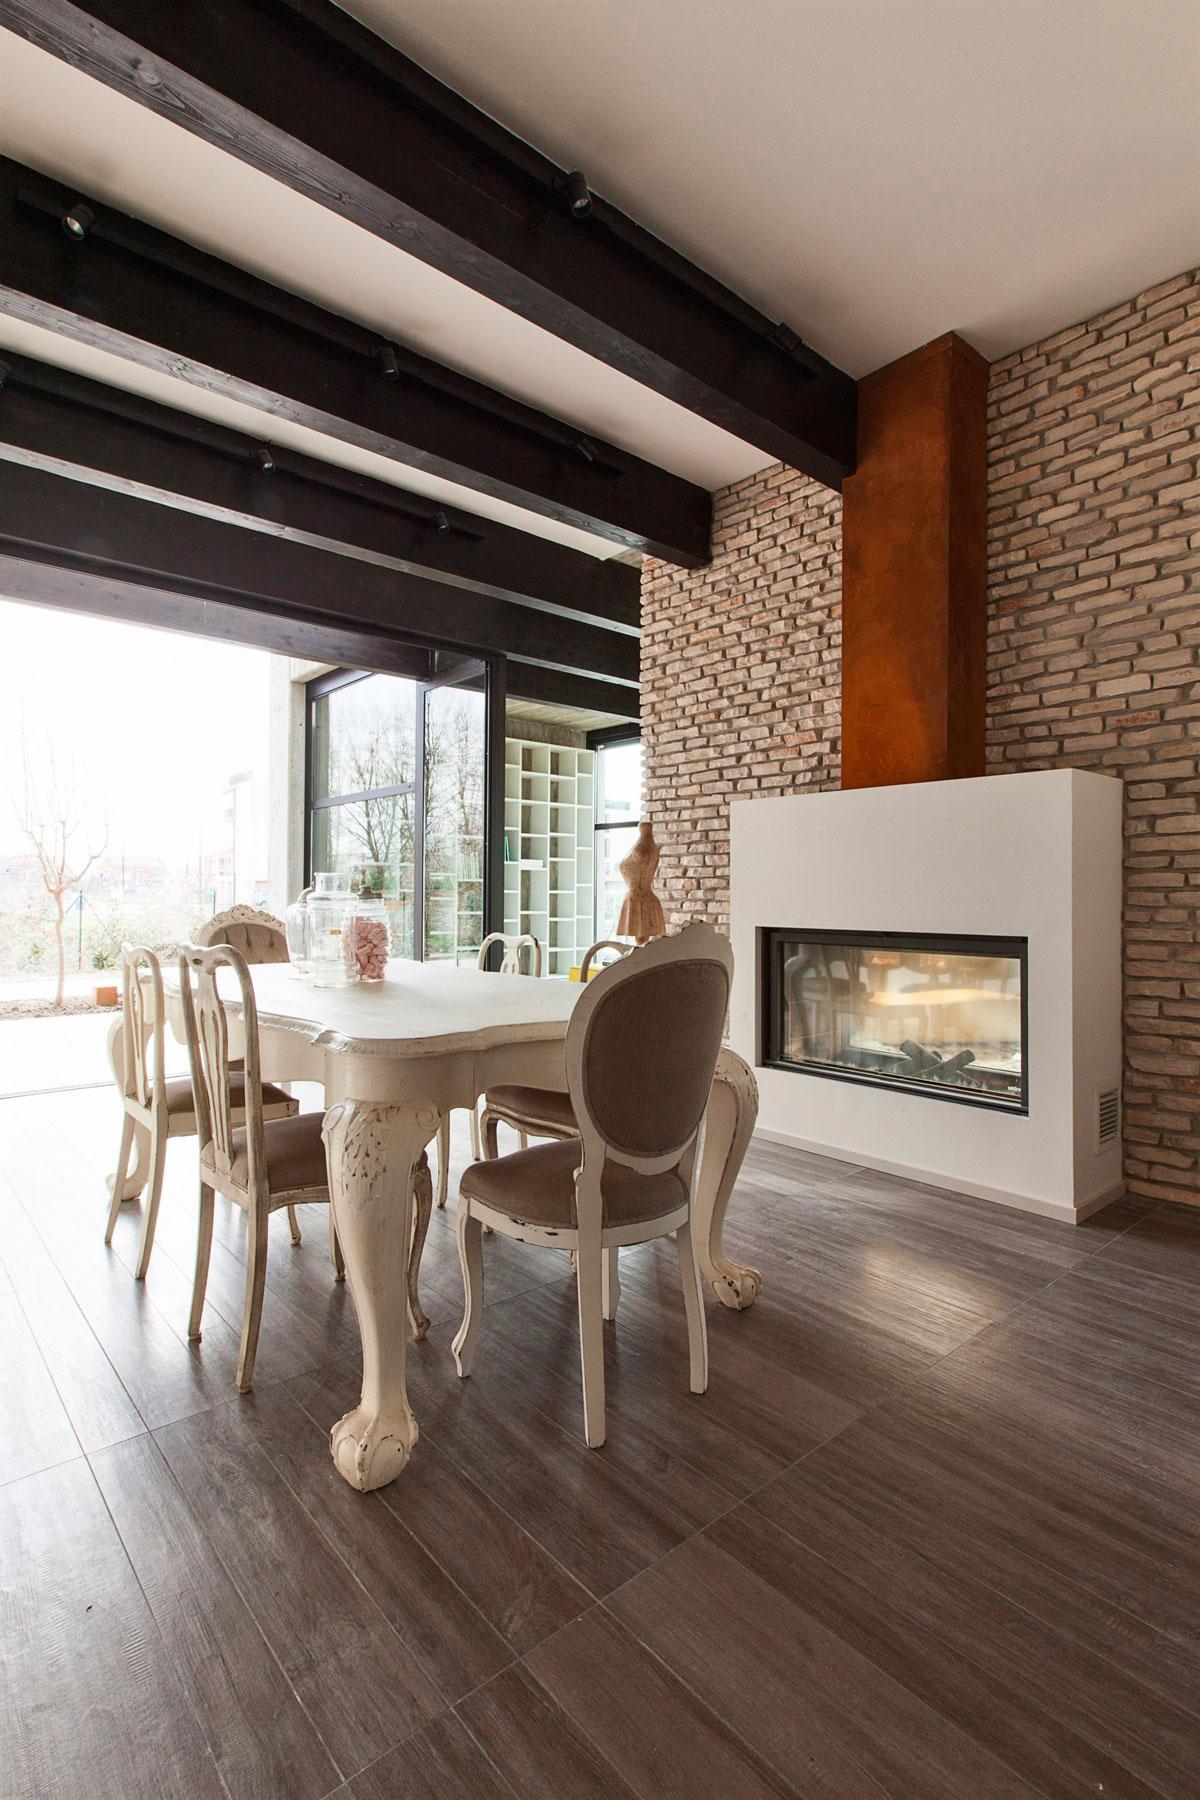 D'Autore Residence near Bologna by Giraldi Associati Architetti-25